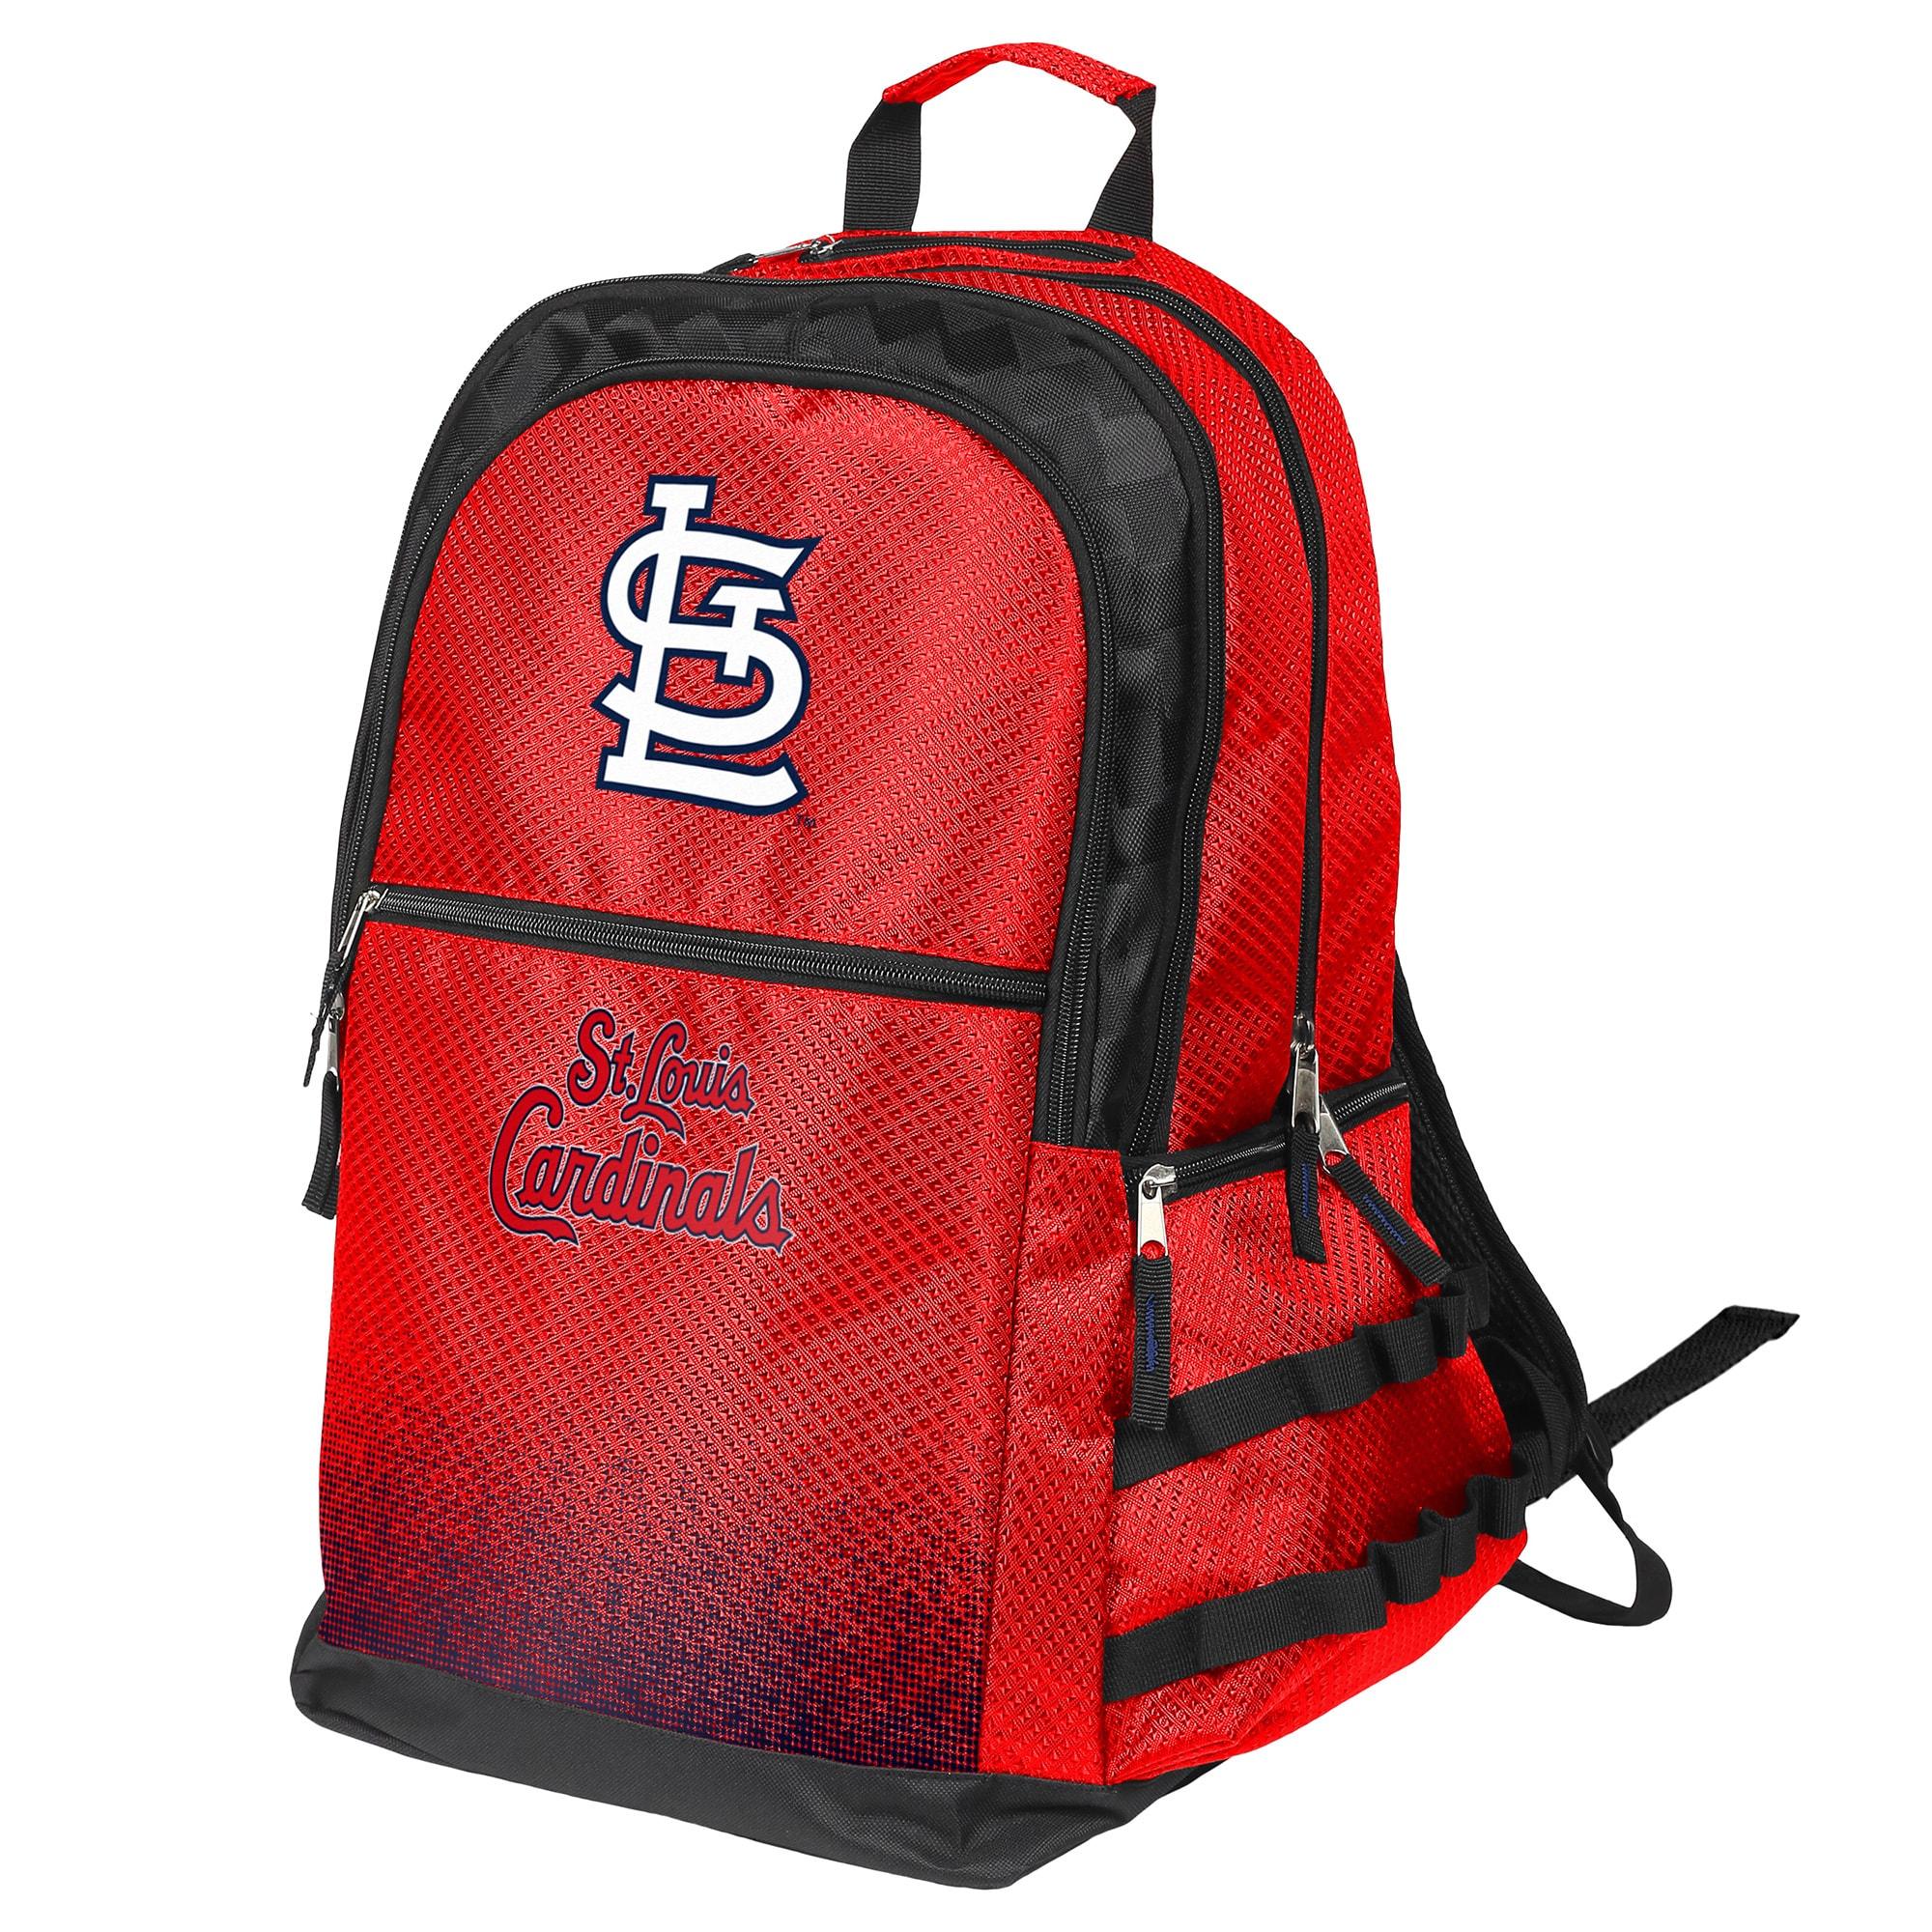 St. Louis Cardinals Gradient Elite Backpack